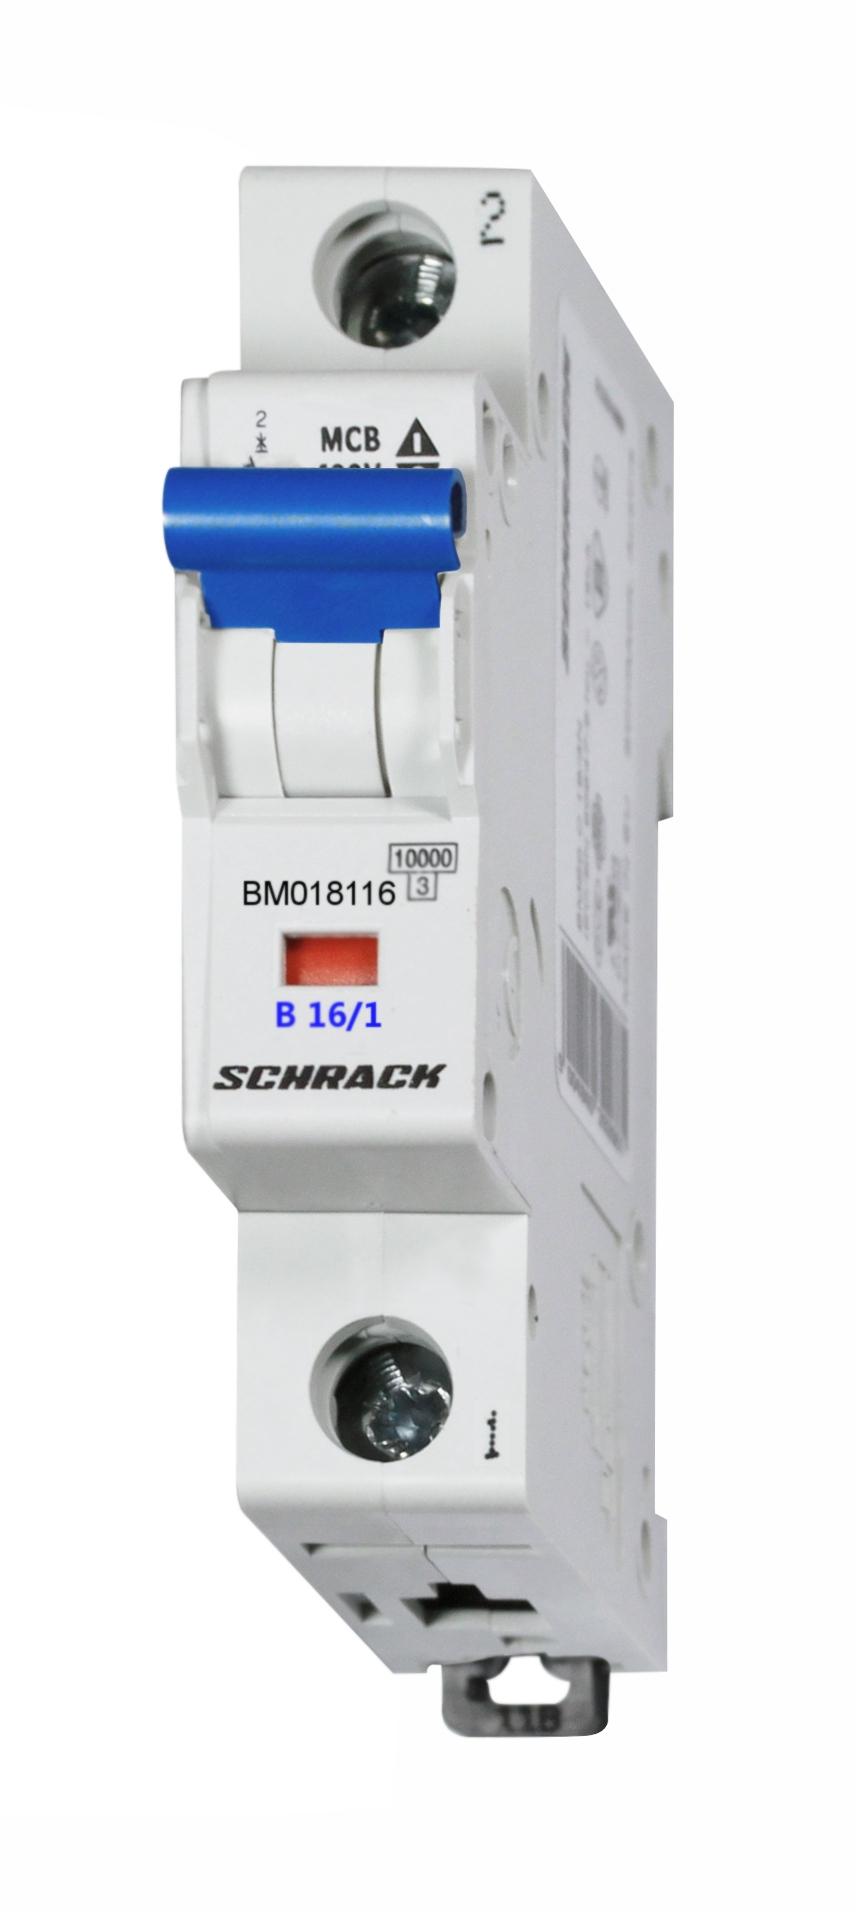 BM018116 - Schrack Technik